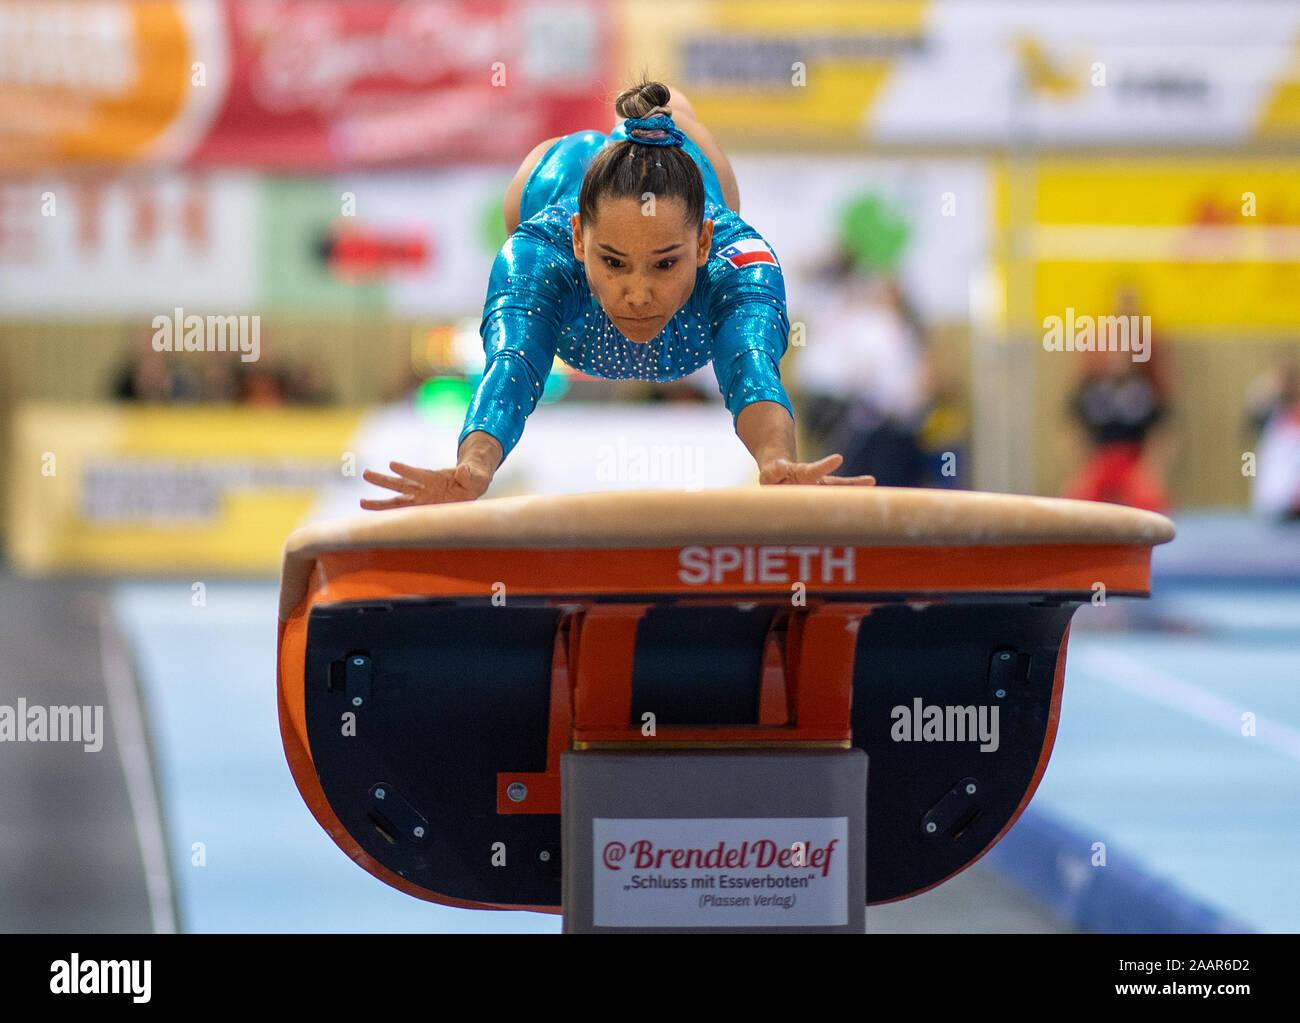 Cottbus, Germany. 23rd Nov, 2019. Gymnastics: World Cup, 44th International Tournament of Champions, Women's Final: Gymnast Makarena Pinto Adasme from Chile jumping. Credit: Monika Skolimowska/dpa-Zentralbild/dpa/Alamy Live News Stock Photo